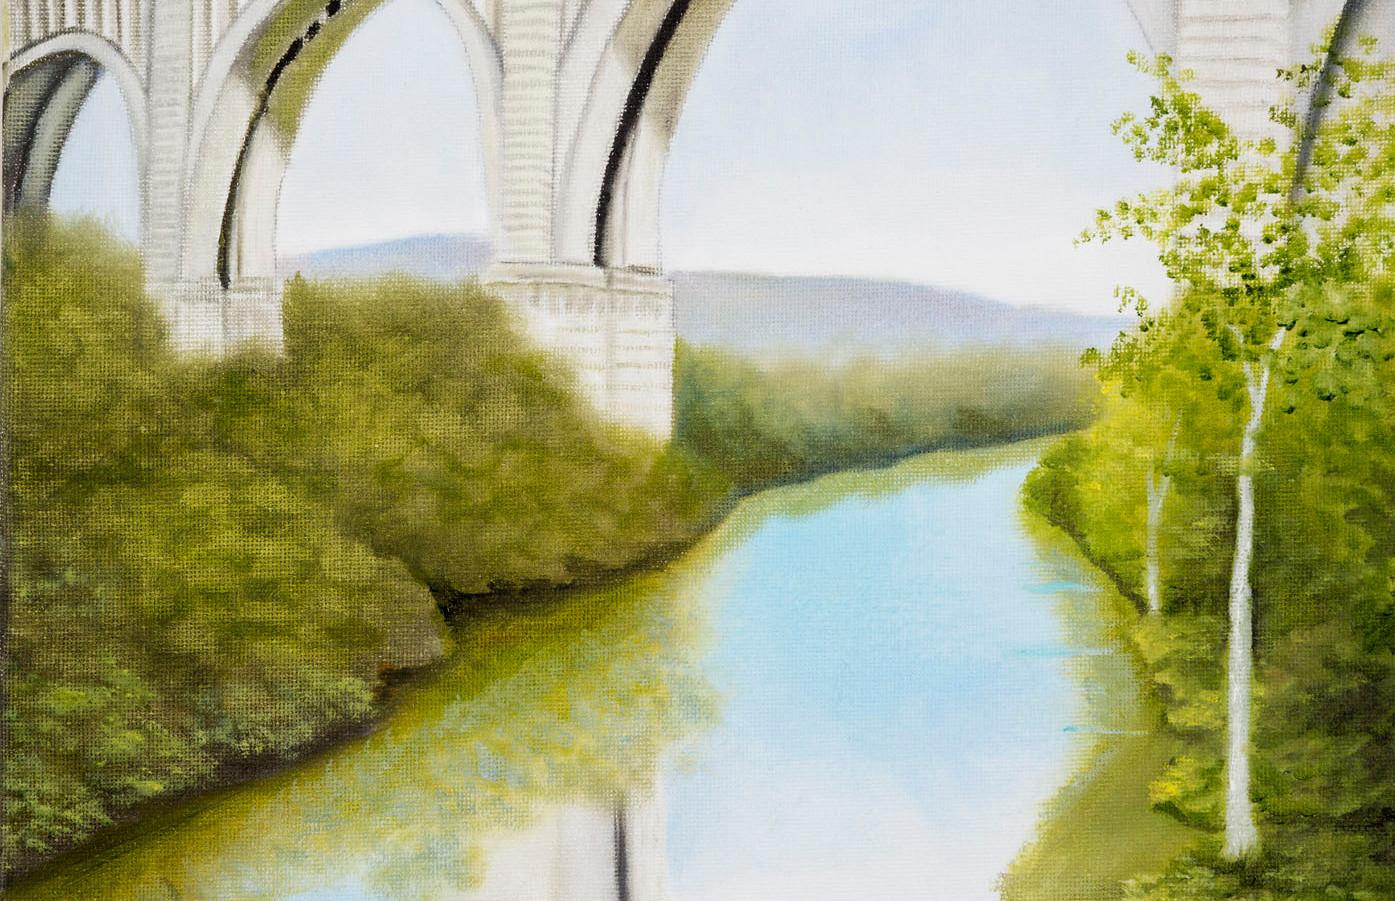 Nicholson Bridge with Reflection Van Zan